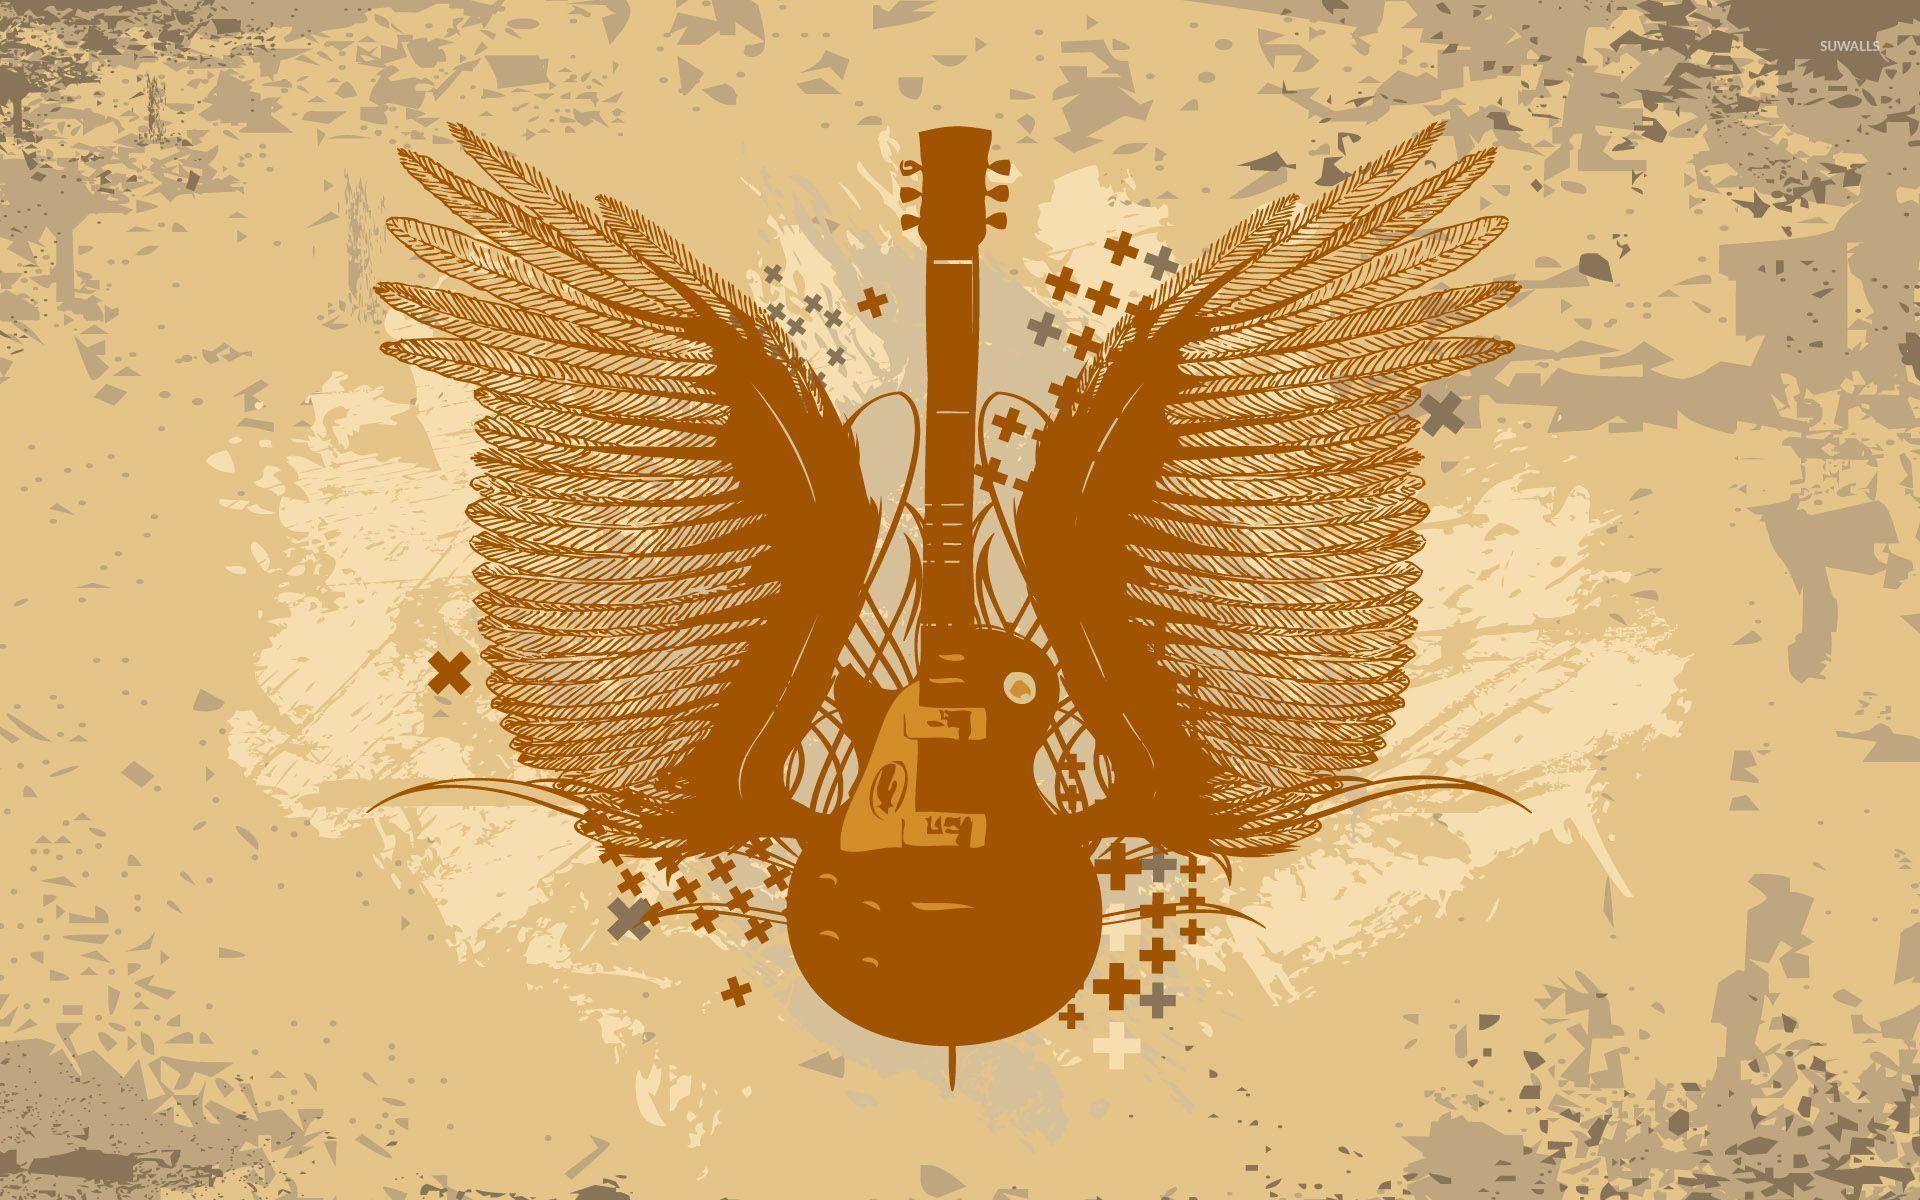 Guitar With Wings Wallpaper